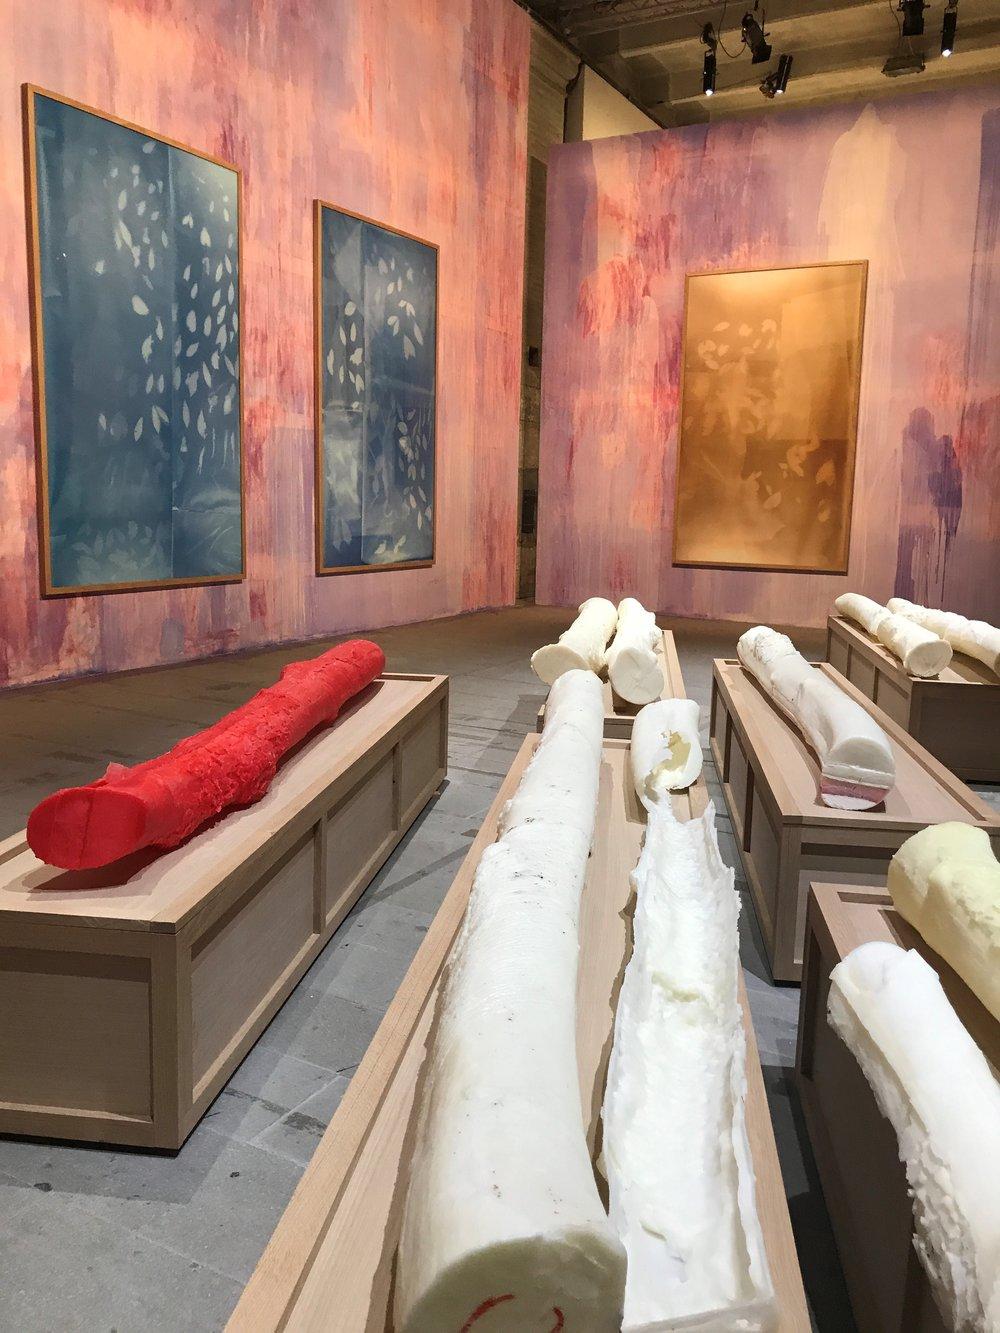 Thu Van Tran's installation